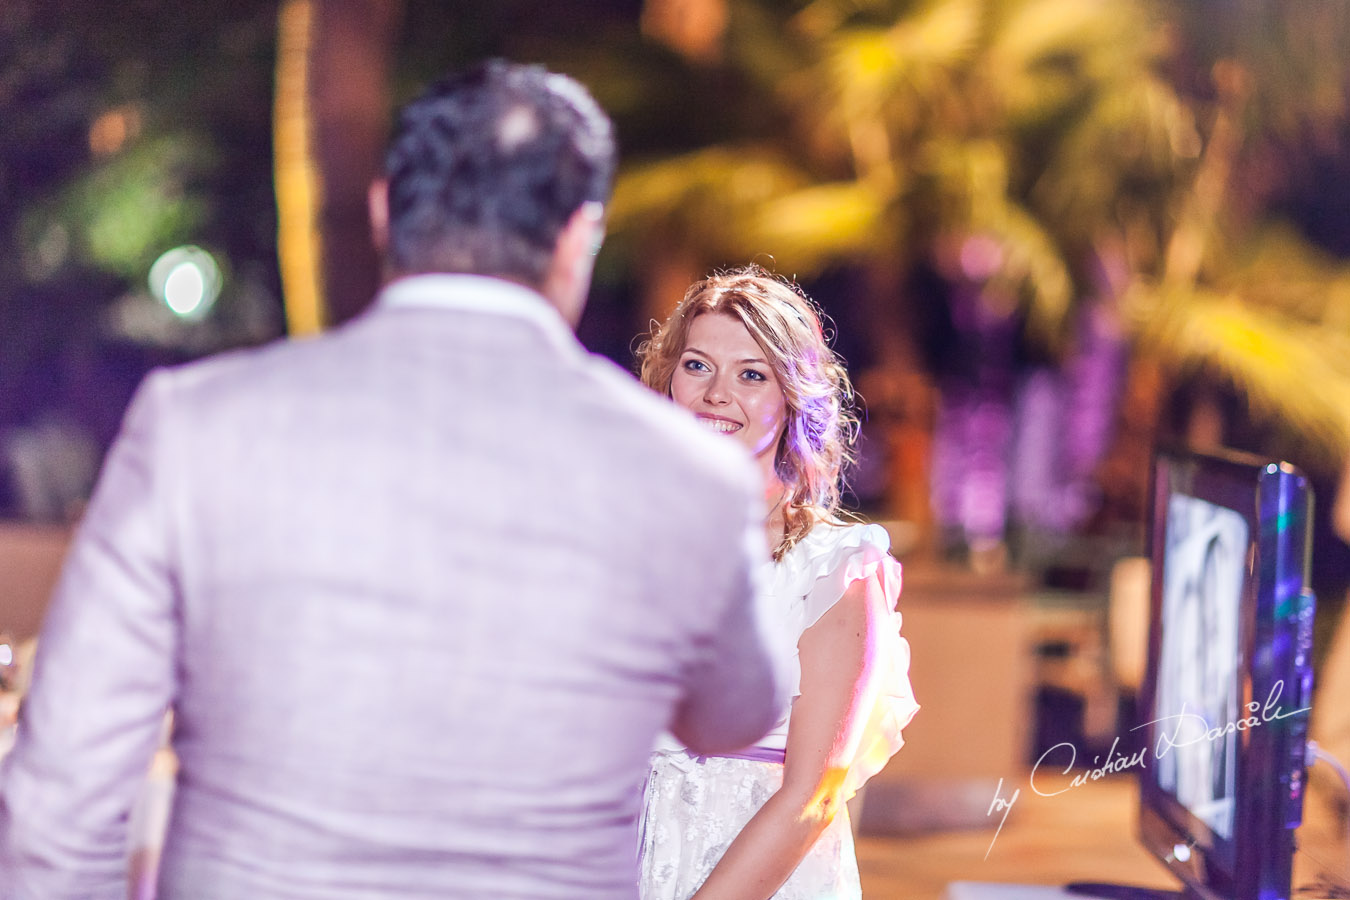 Amathus Limassol Wedding. Cyprus Photographer: Cristian Dascalu